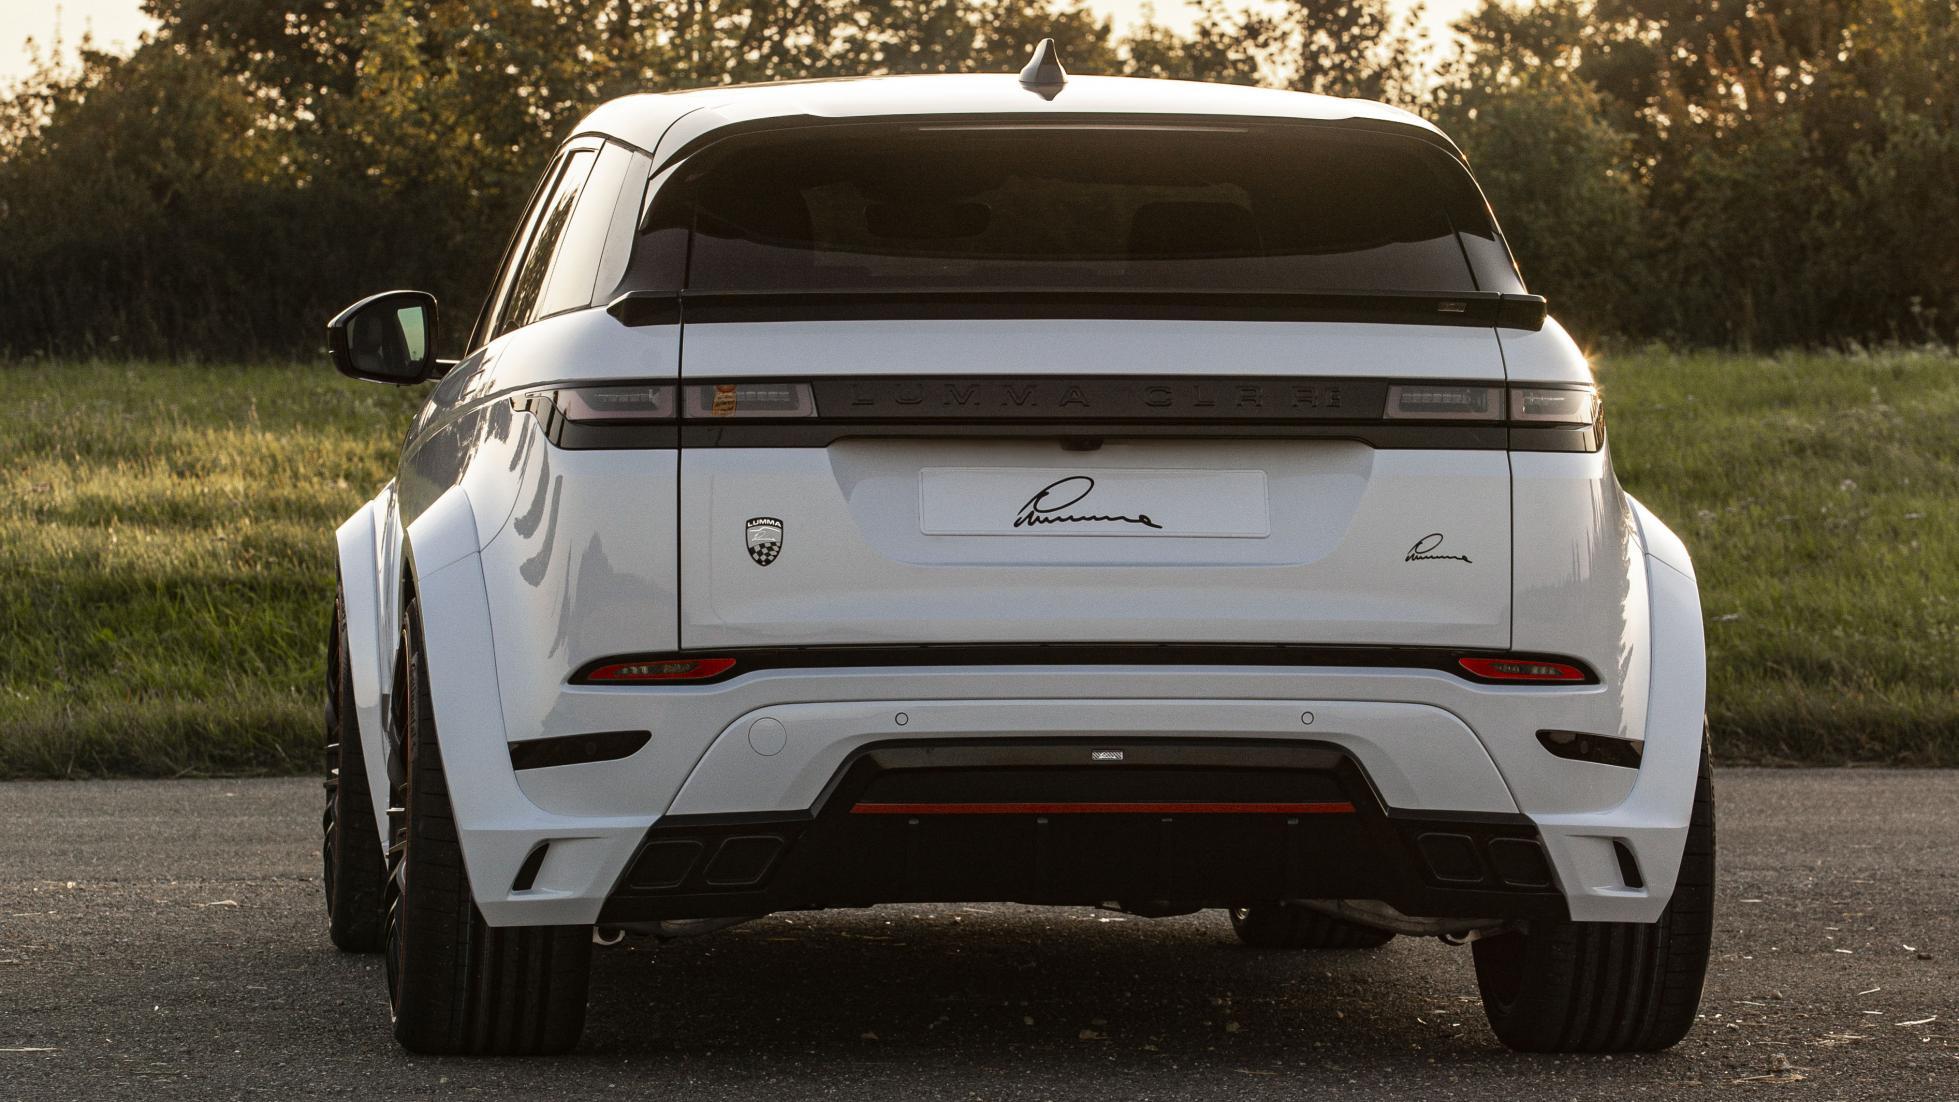 Range-Rover-Evoque-by-Lumma-Design-11